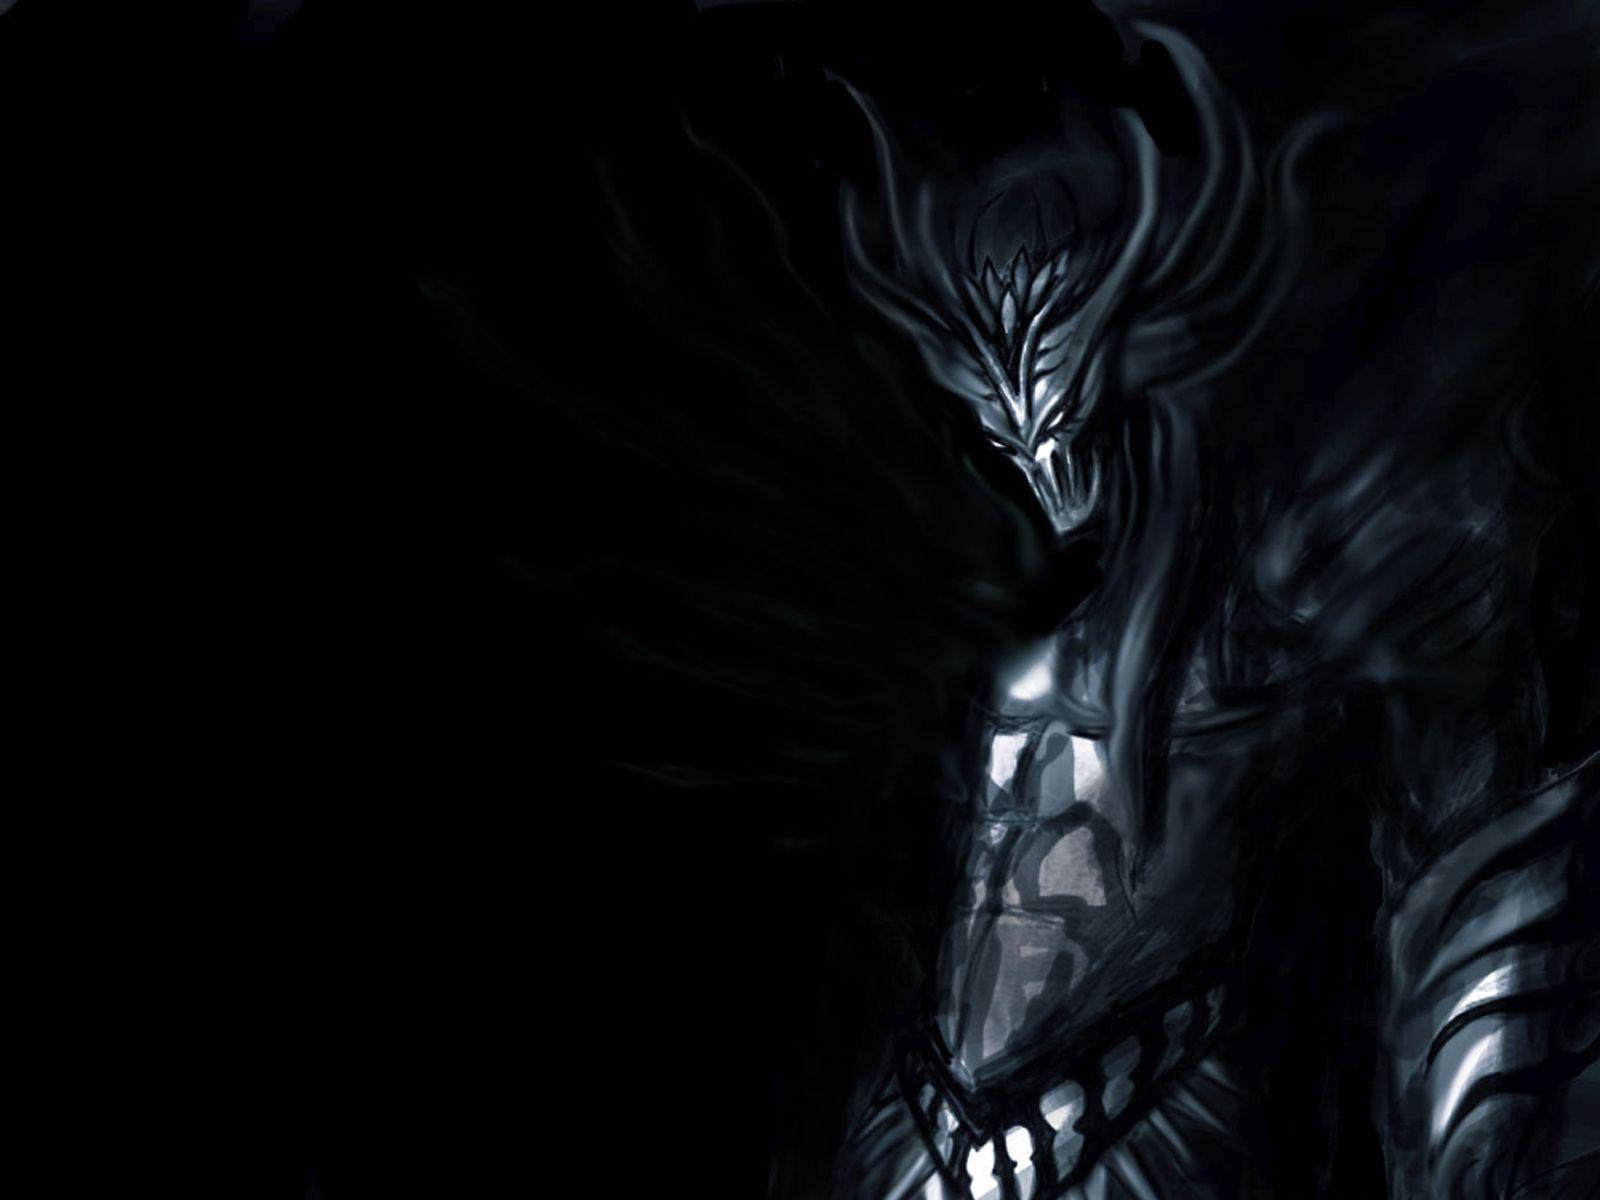 Black Smoke Snakes muscular black devil wallpaper gothic